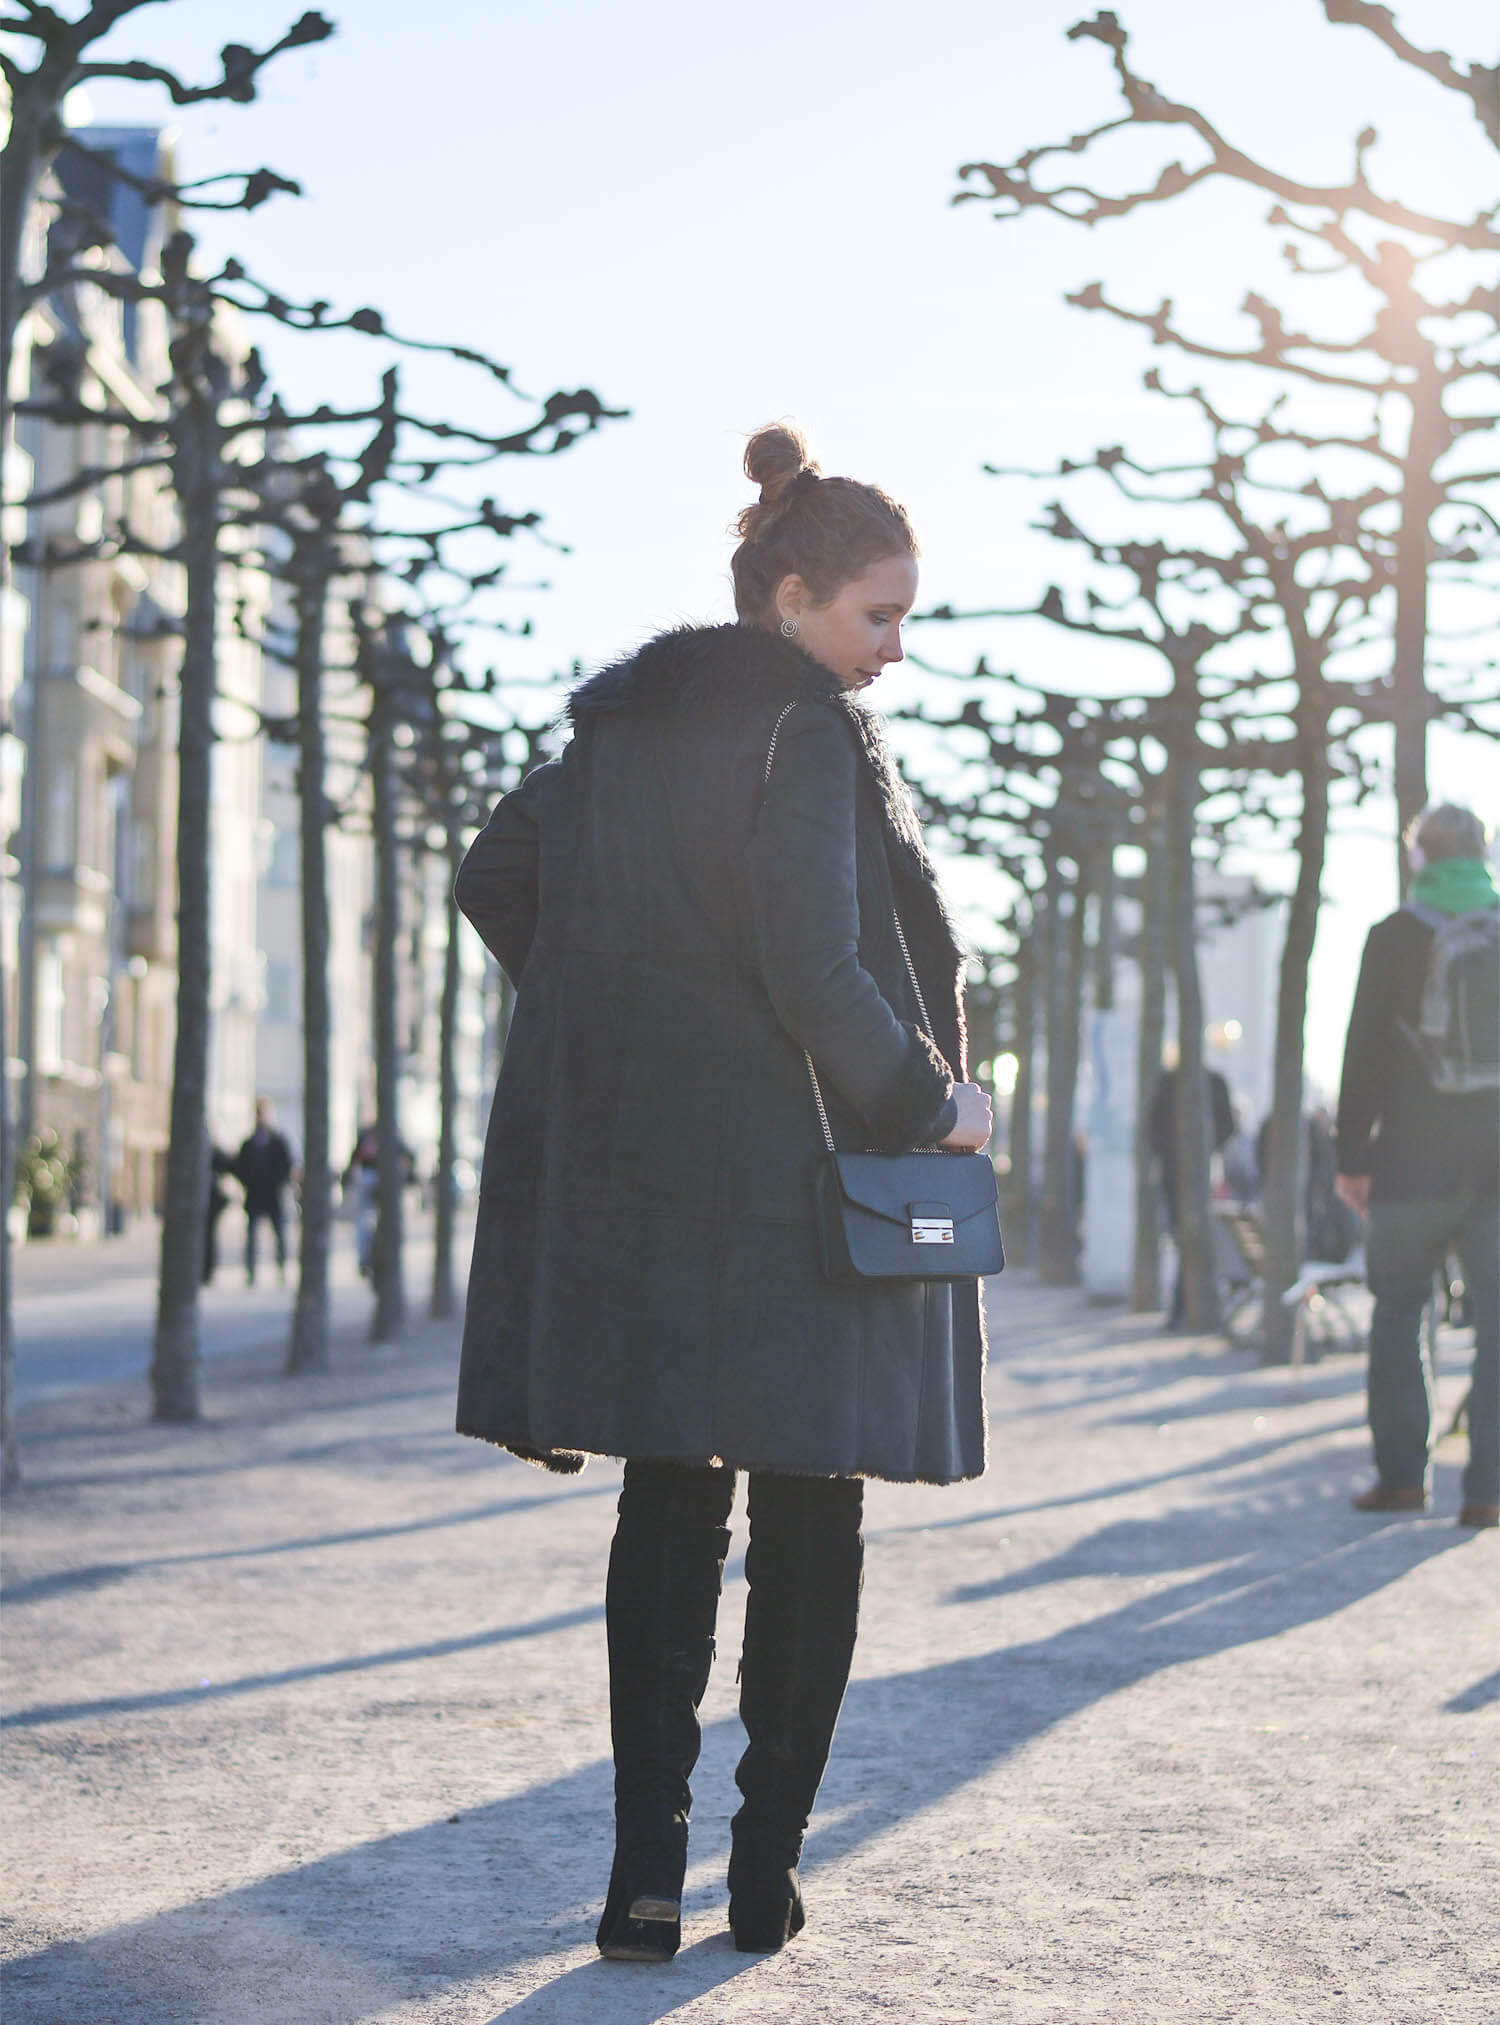 Kationette-fashionblog-Outfit-Shadesofgrey-Shearling-Knit-Overknees-Dusseldorf-curls-bun-furla